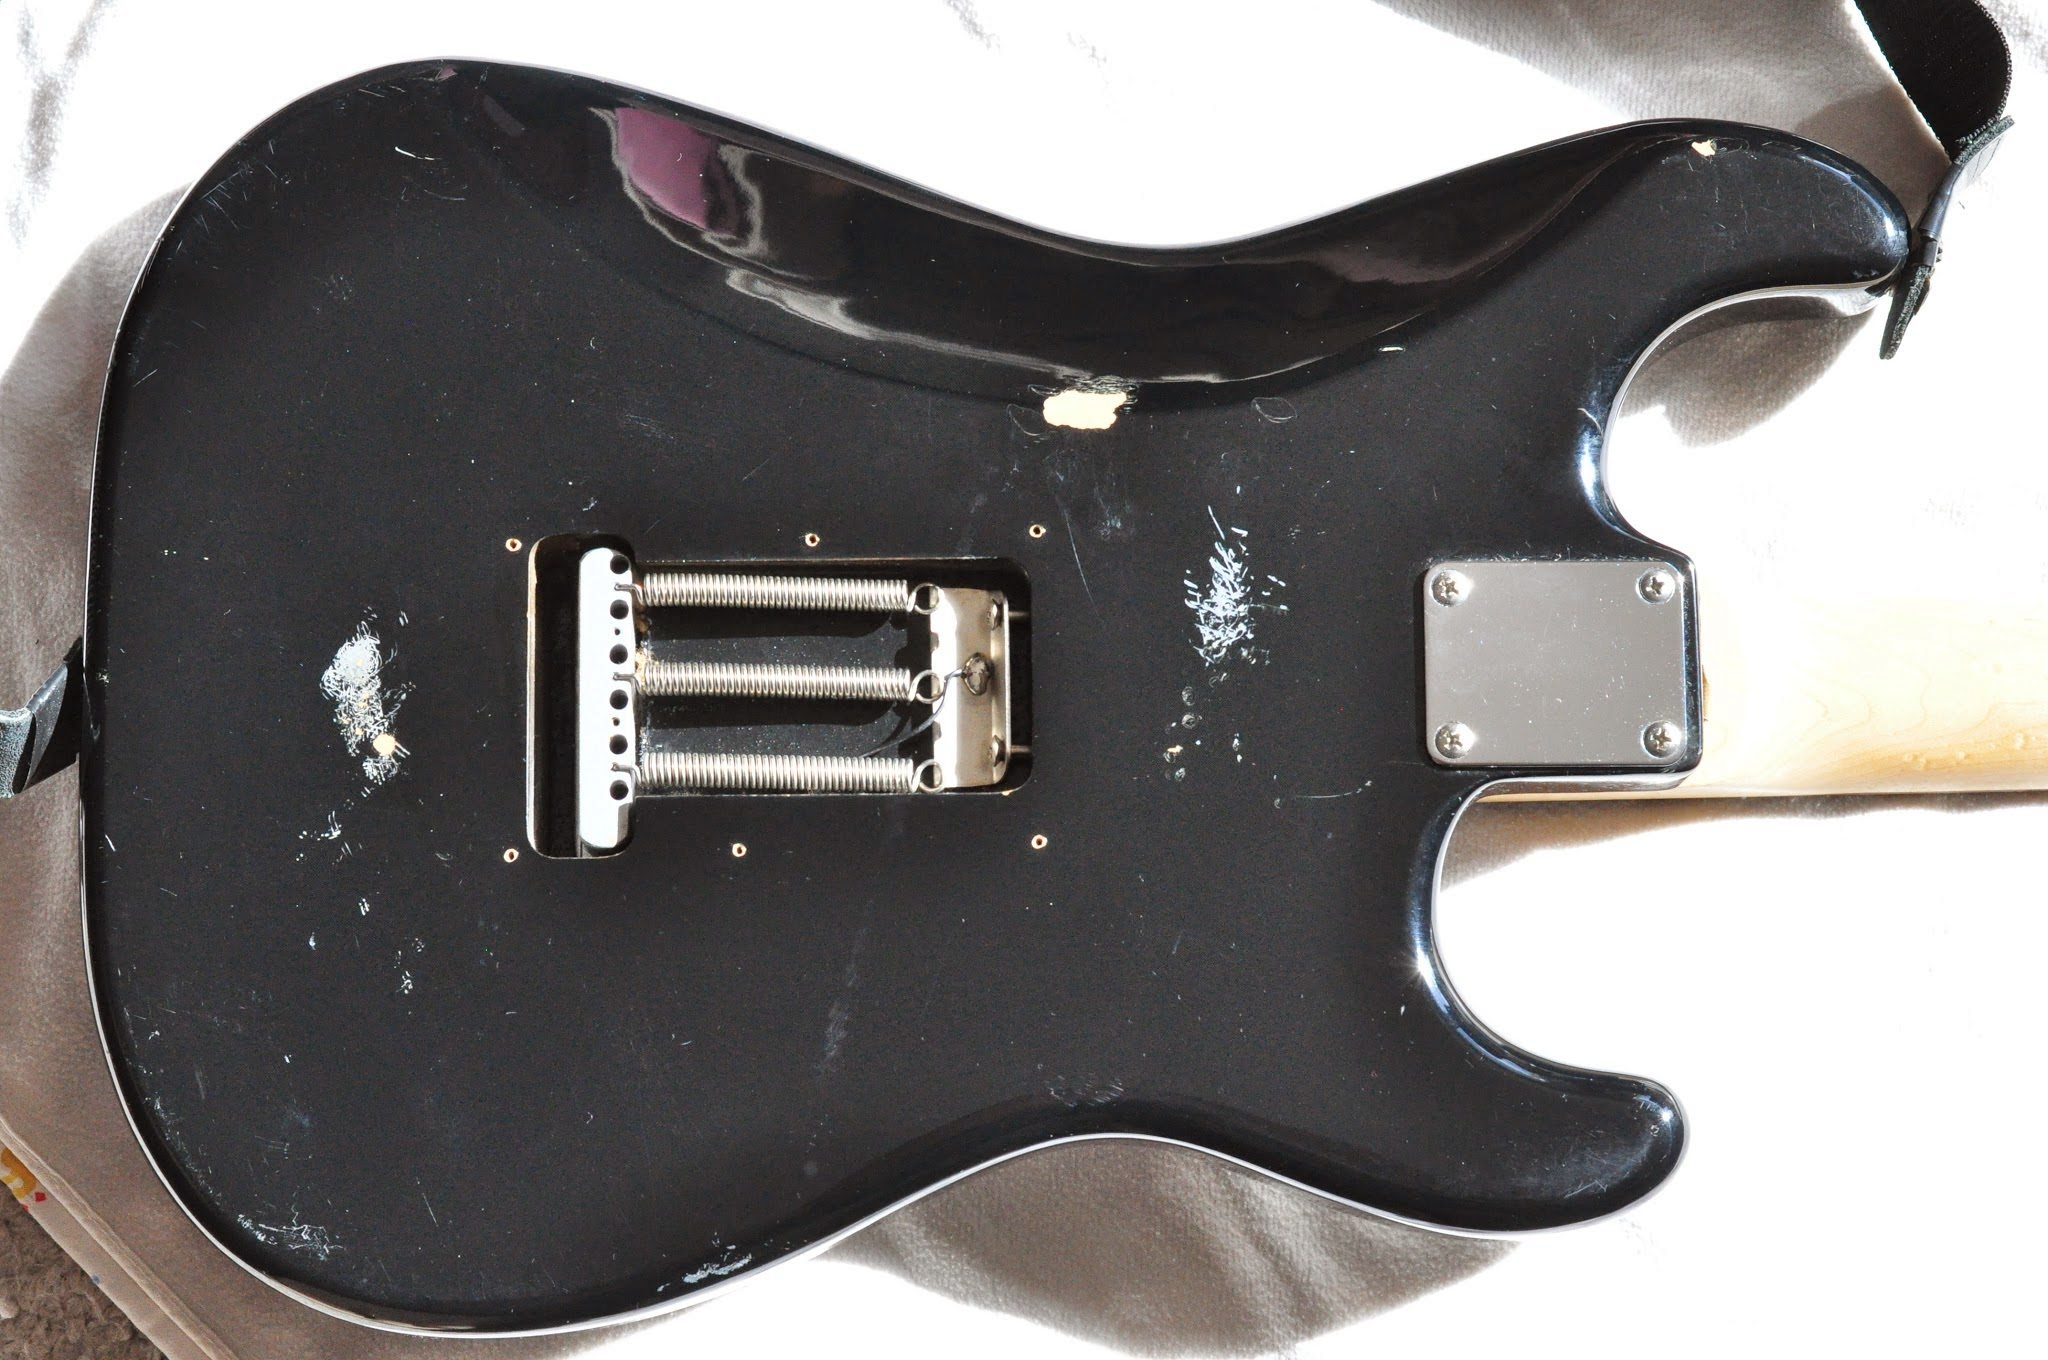 Kurt-Cobain-MIM-Fender-Stratocaster